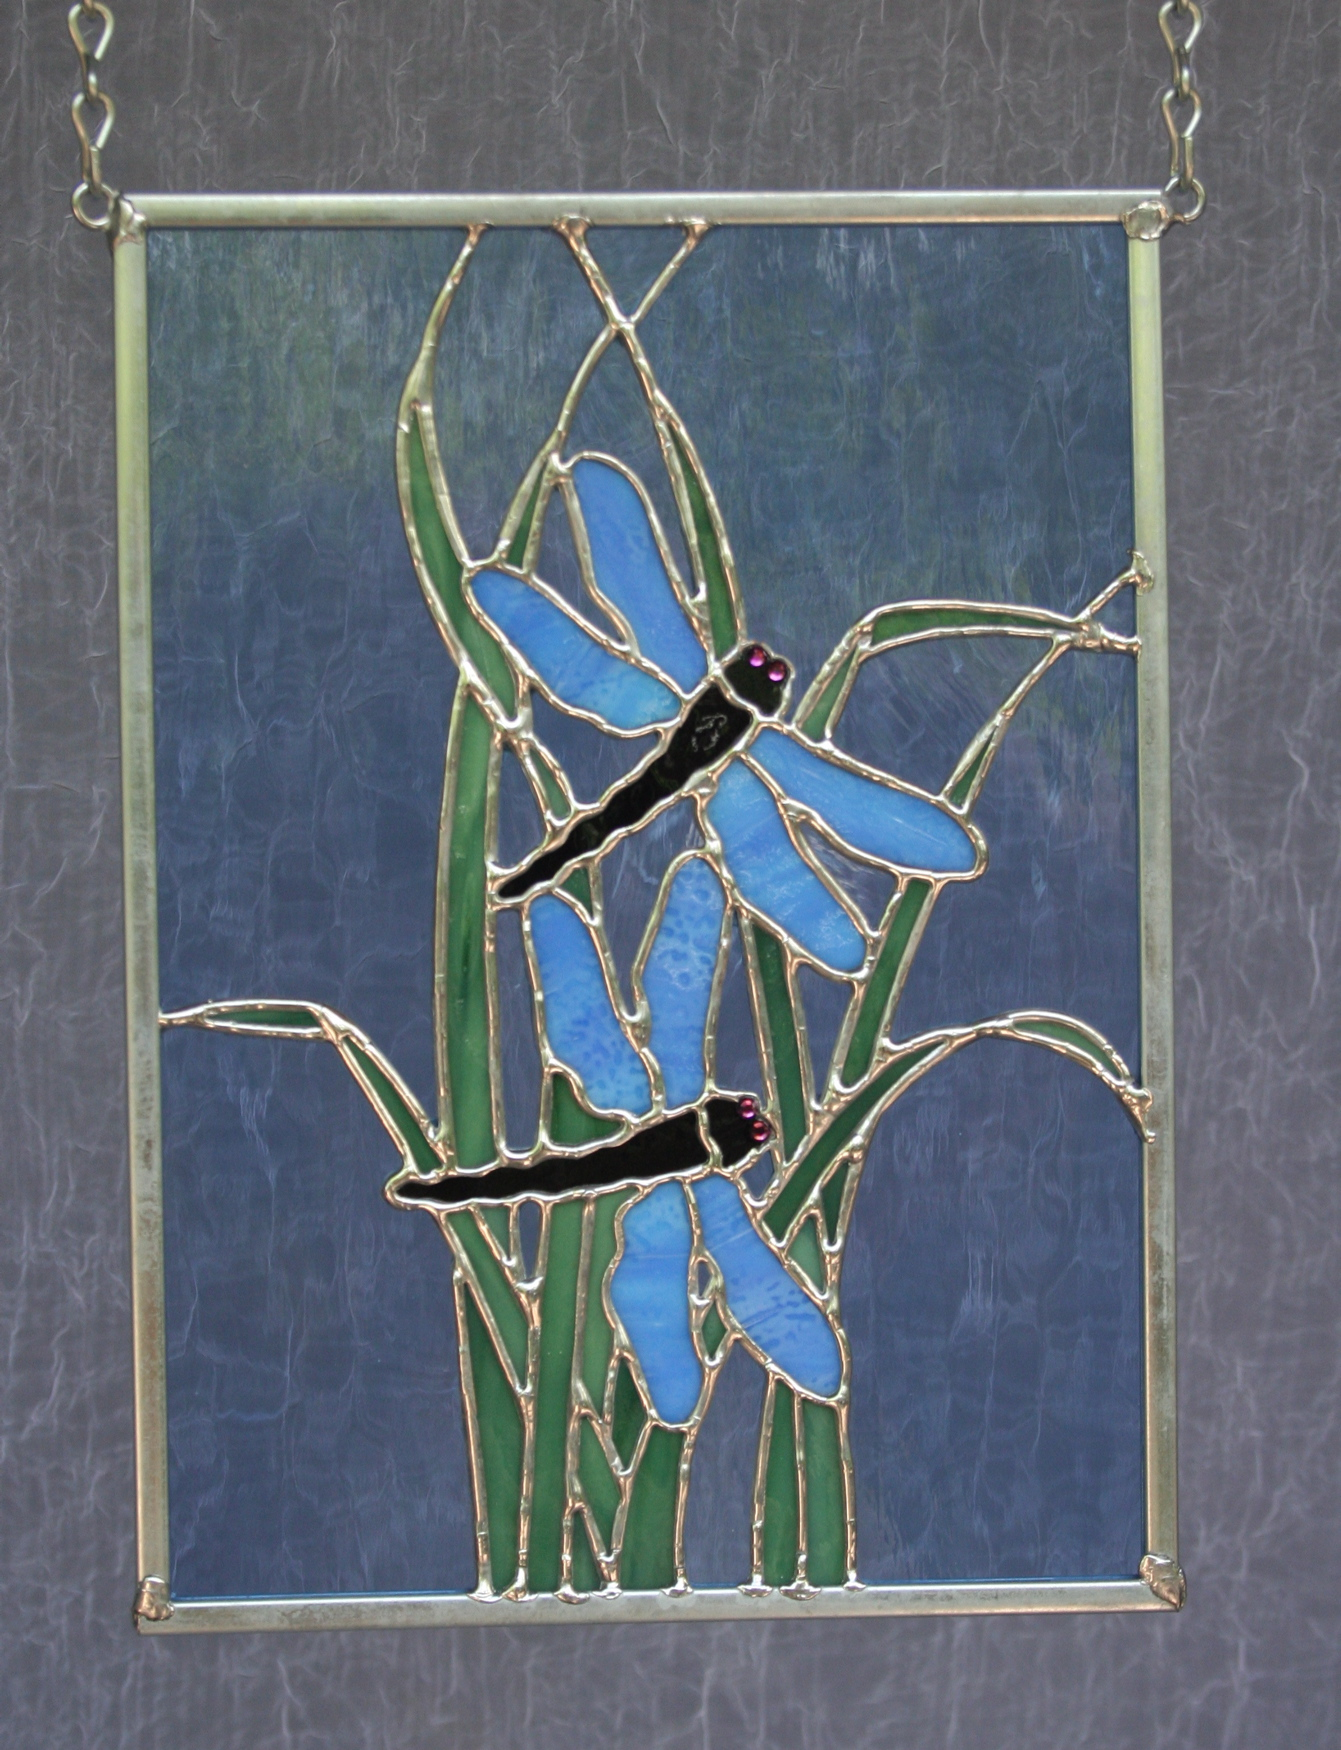 Dragonflies in Grass